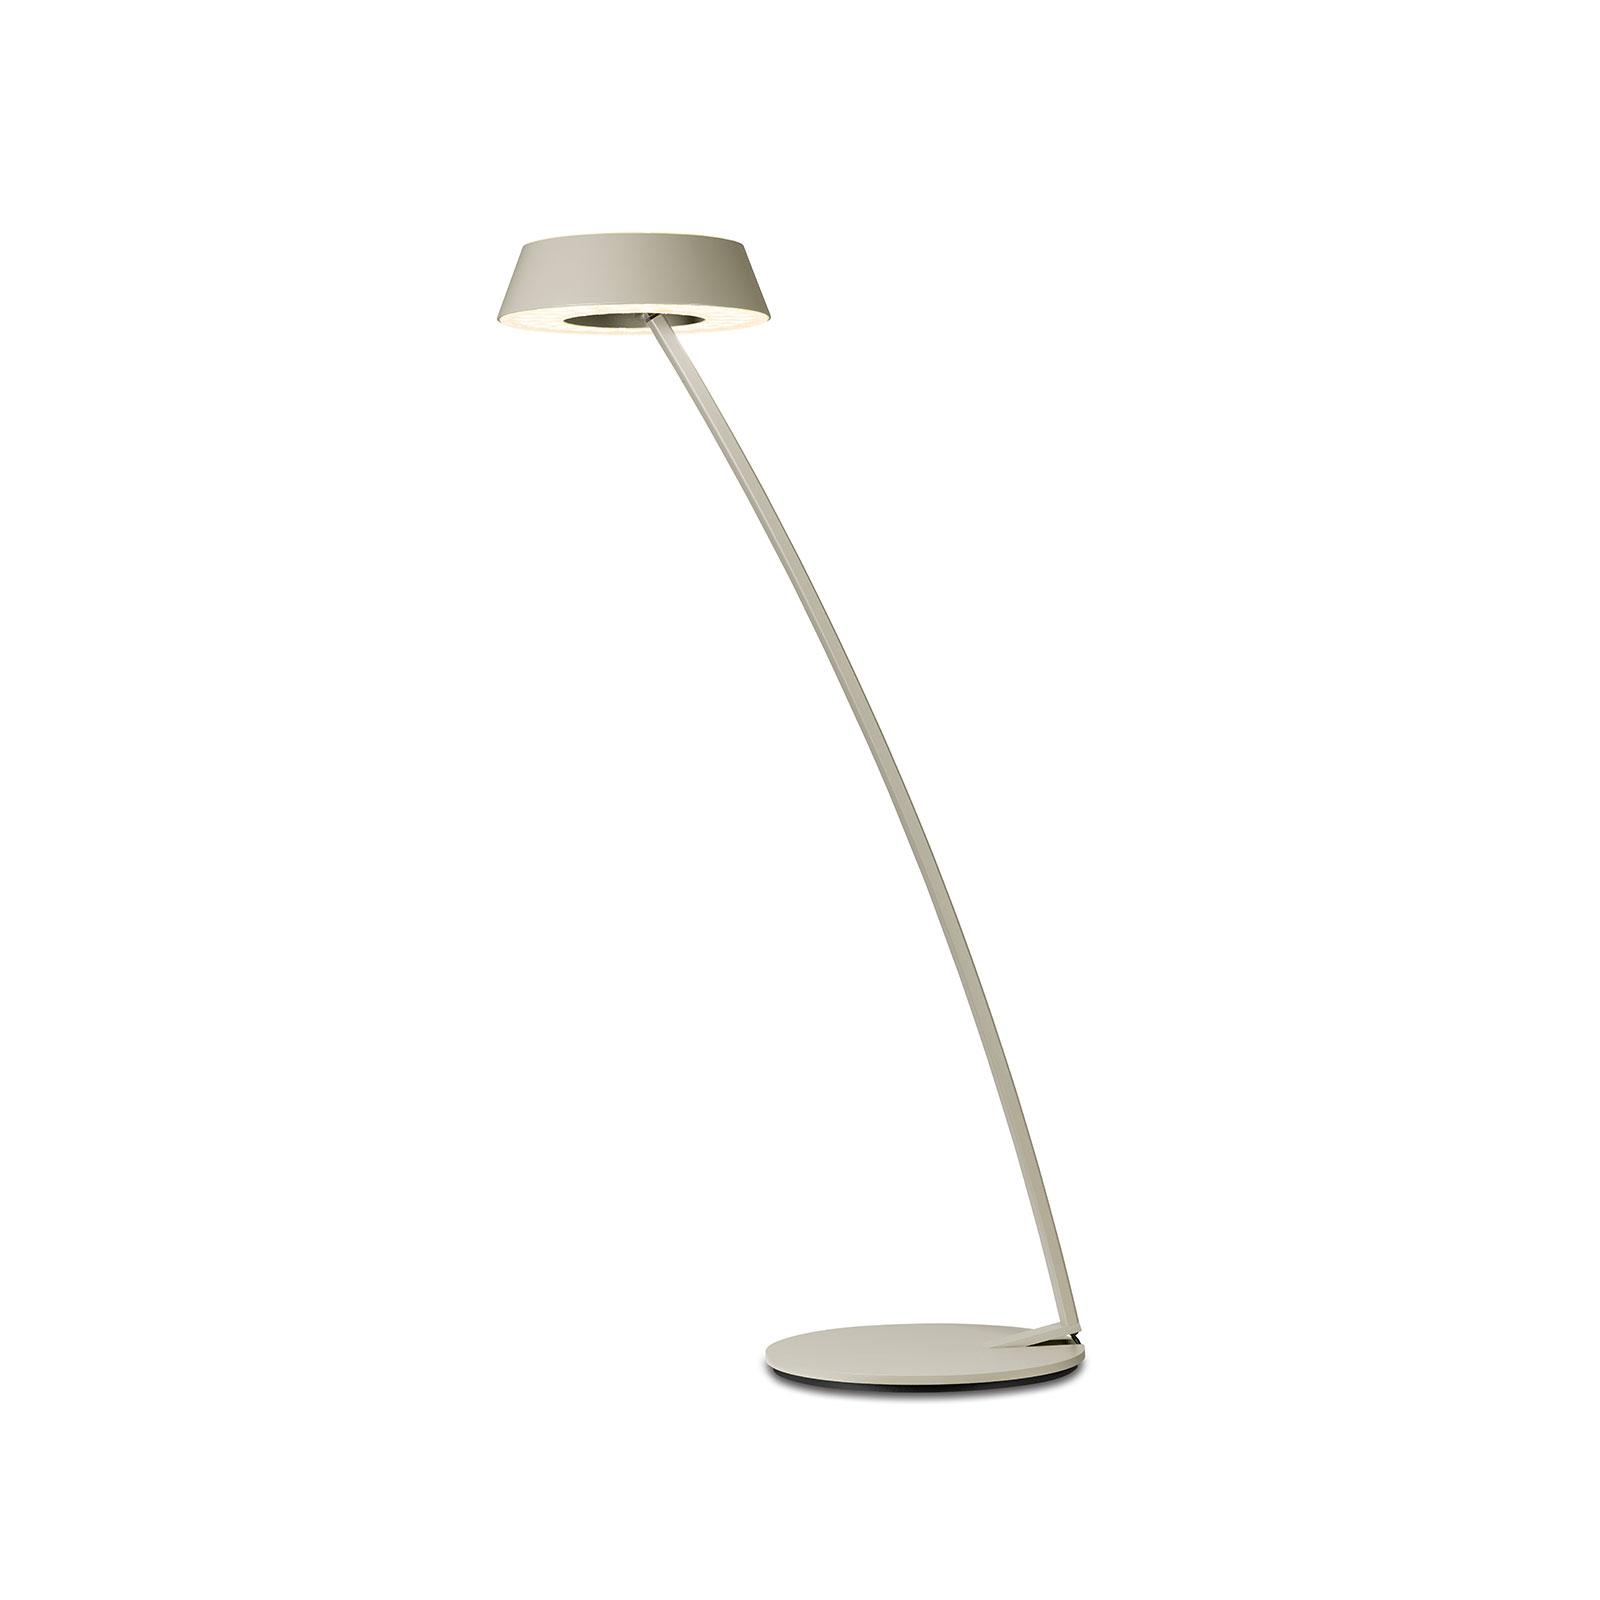 OLIGO Glance LED-Tischlampe gebogen cashmere